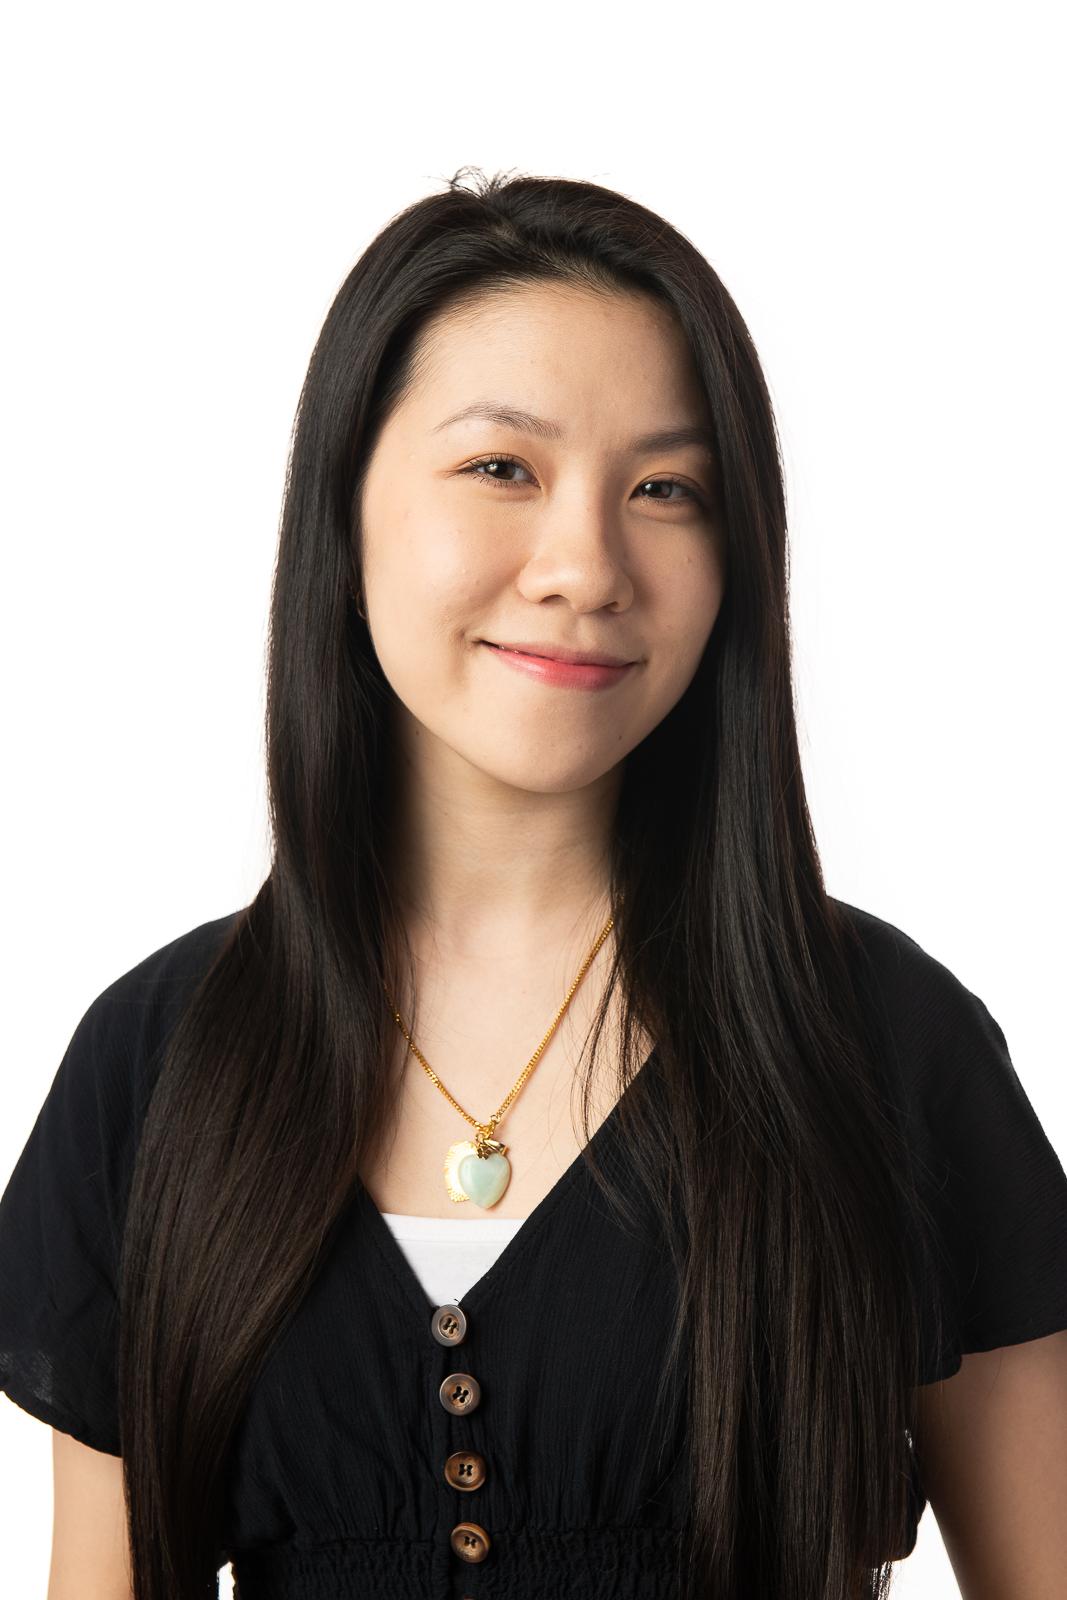 Profile image of smiling Champlain student